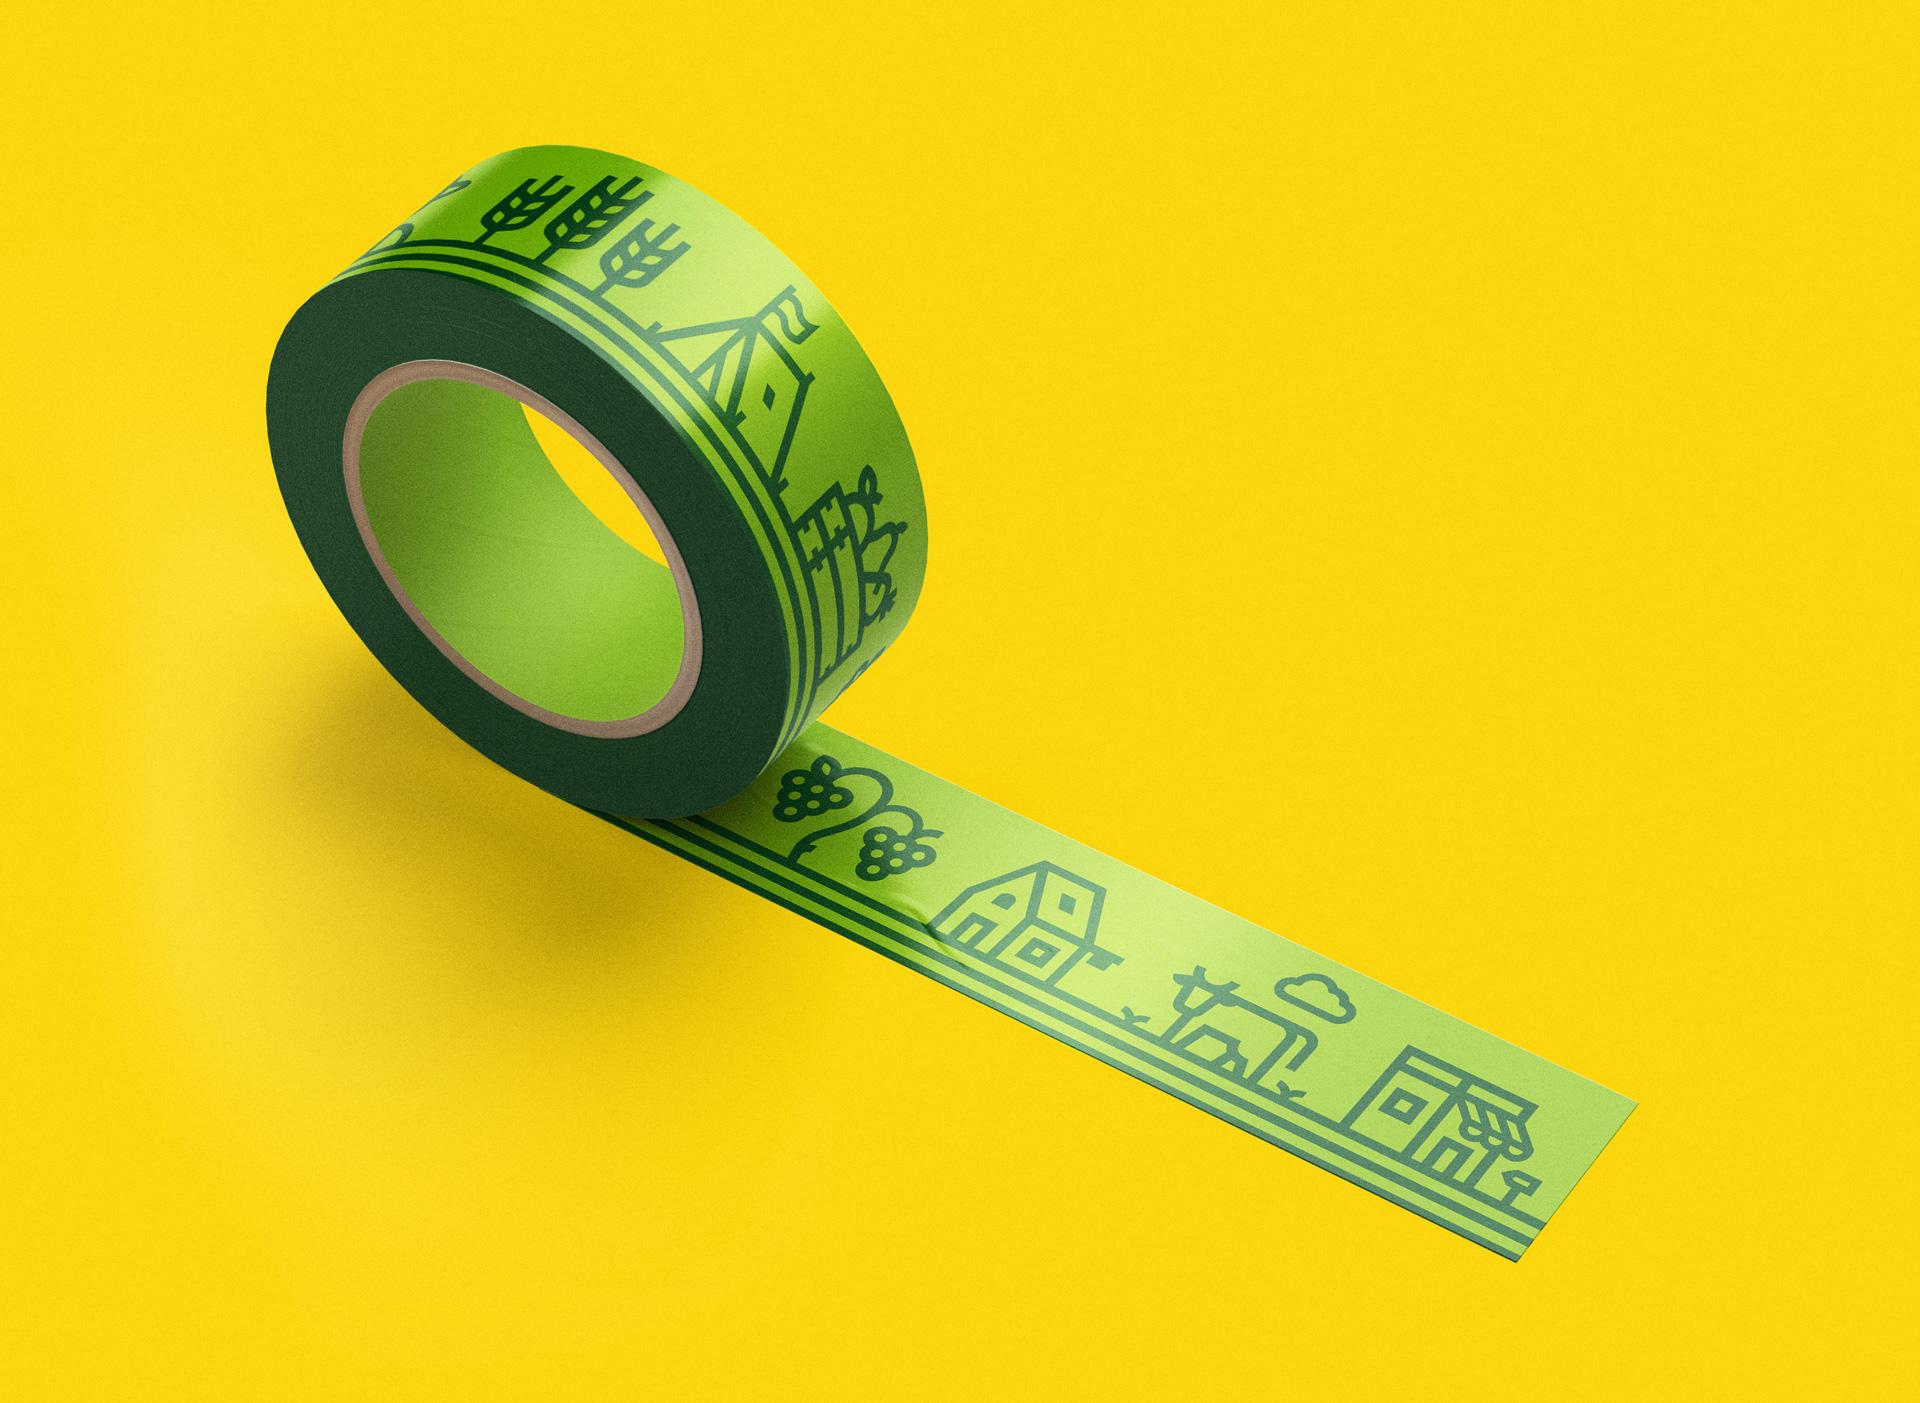 RDA-Icons-Duct-Tape-Yellow-1920-q80-V1-02